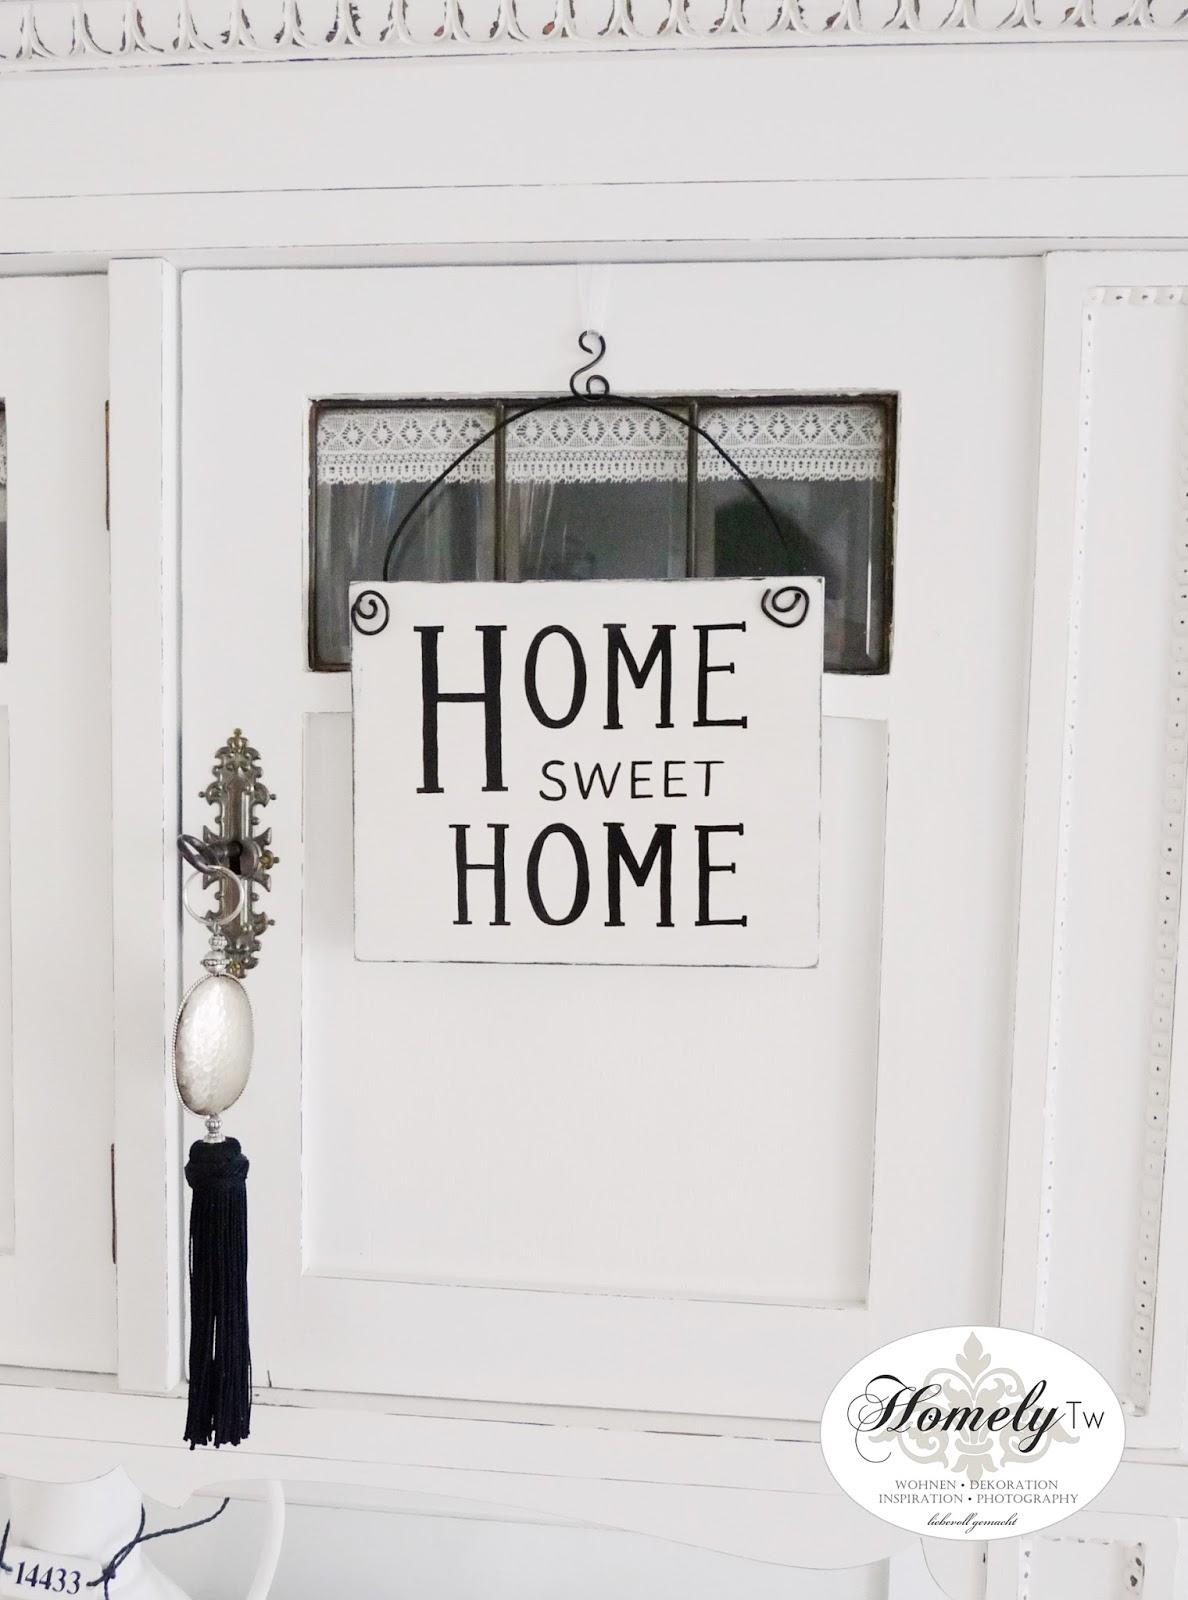 homely tw neue schilder im shop. Black Bedroom Furniture Sets. Home Design Ideas